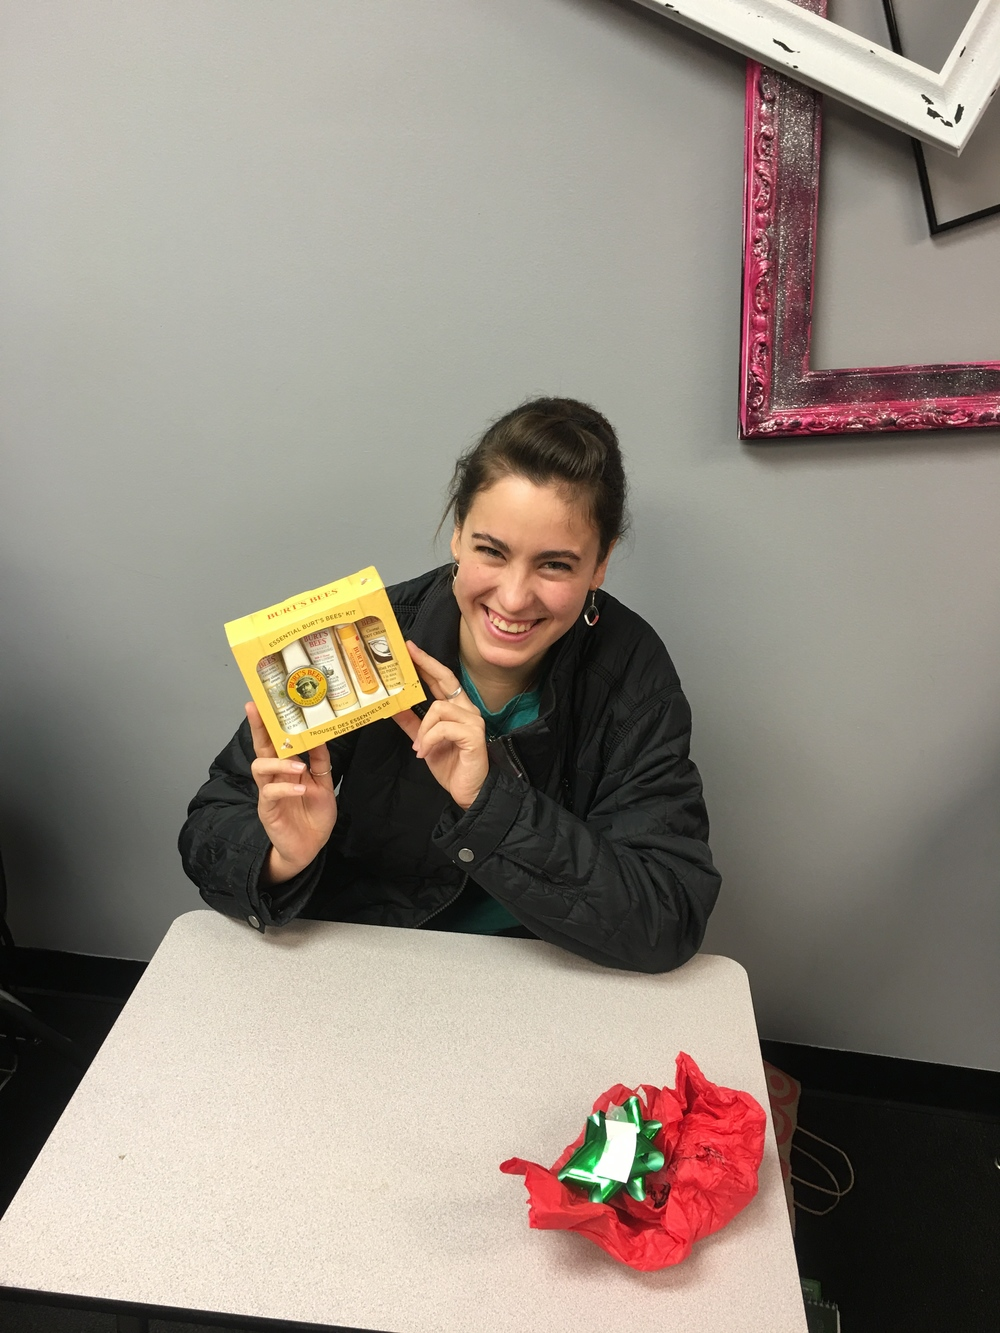 Dental Assistants Celebrate Xmas at DOT By Lynn